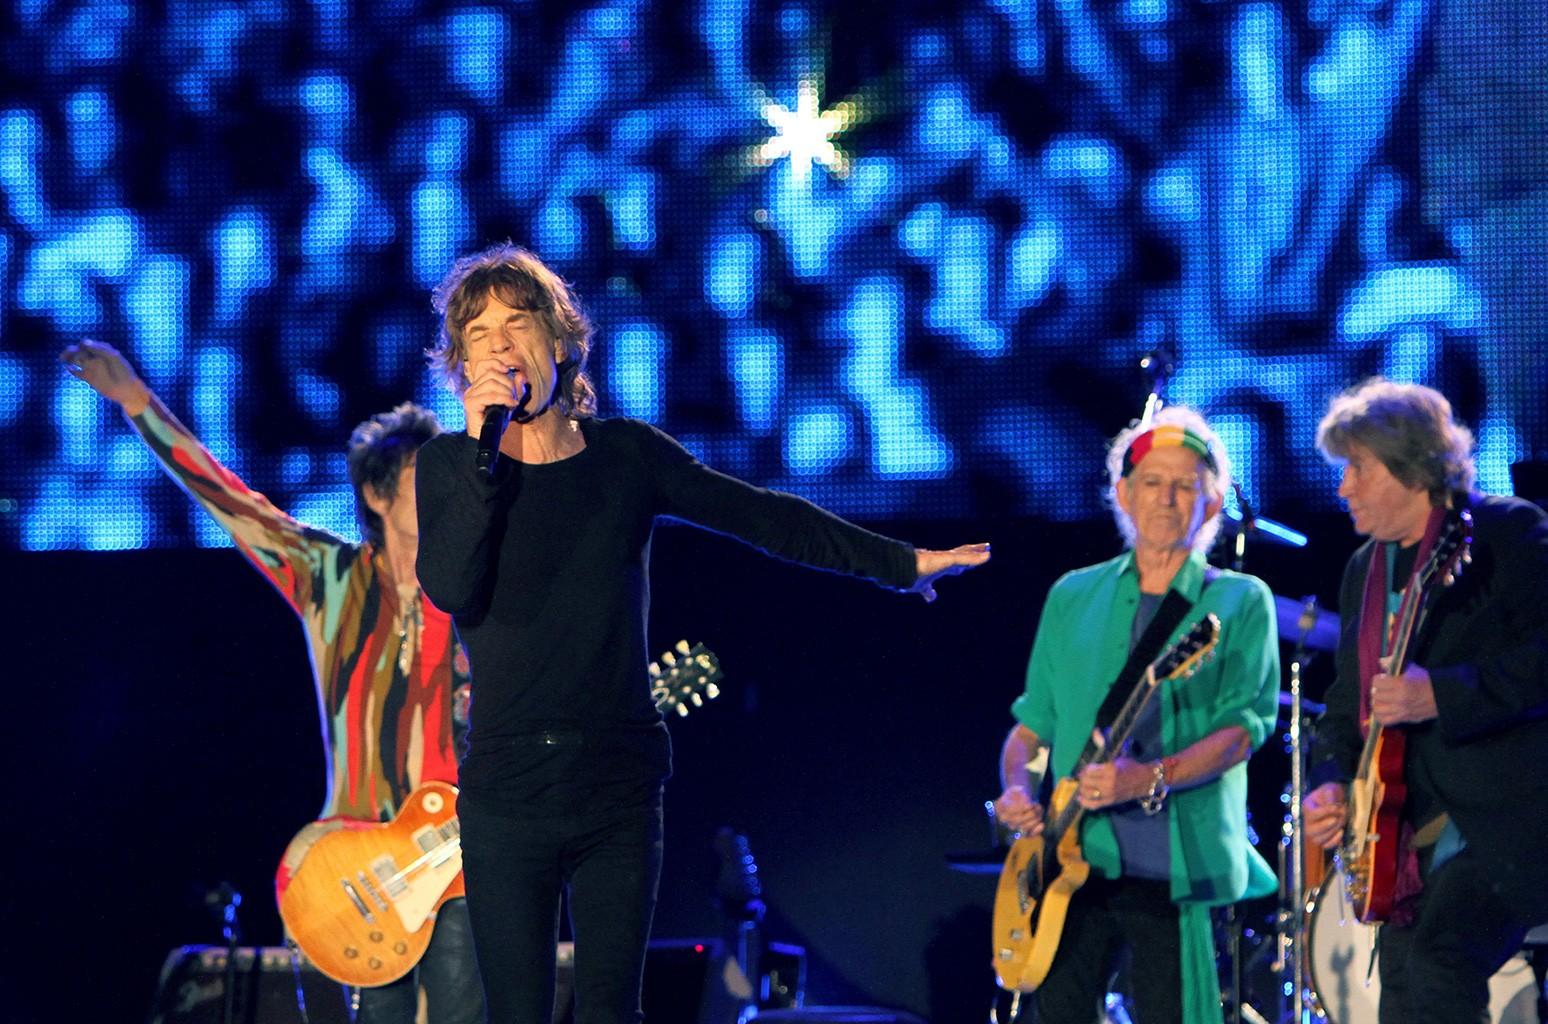 Mick Jagger performs on May 29, 2014.